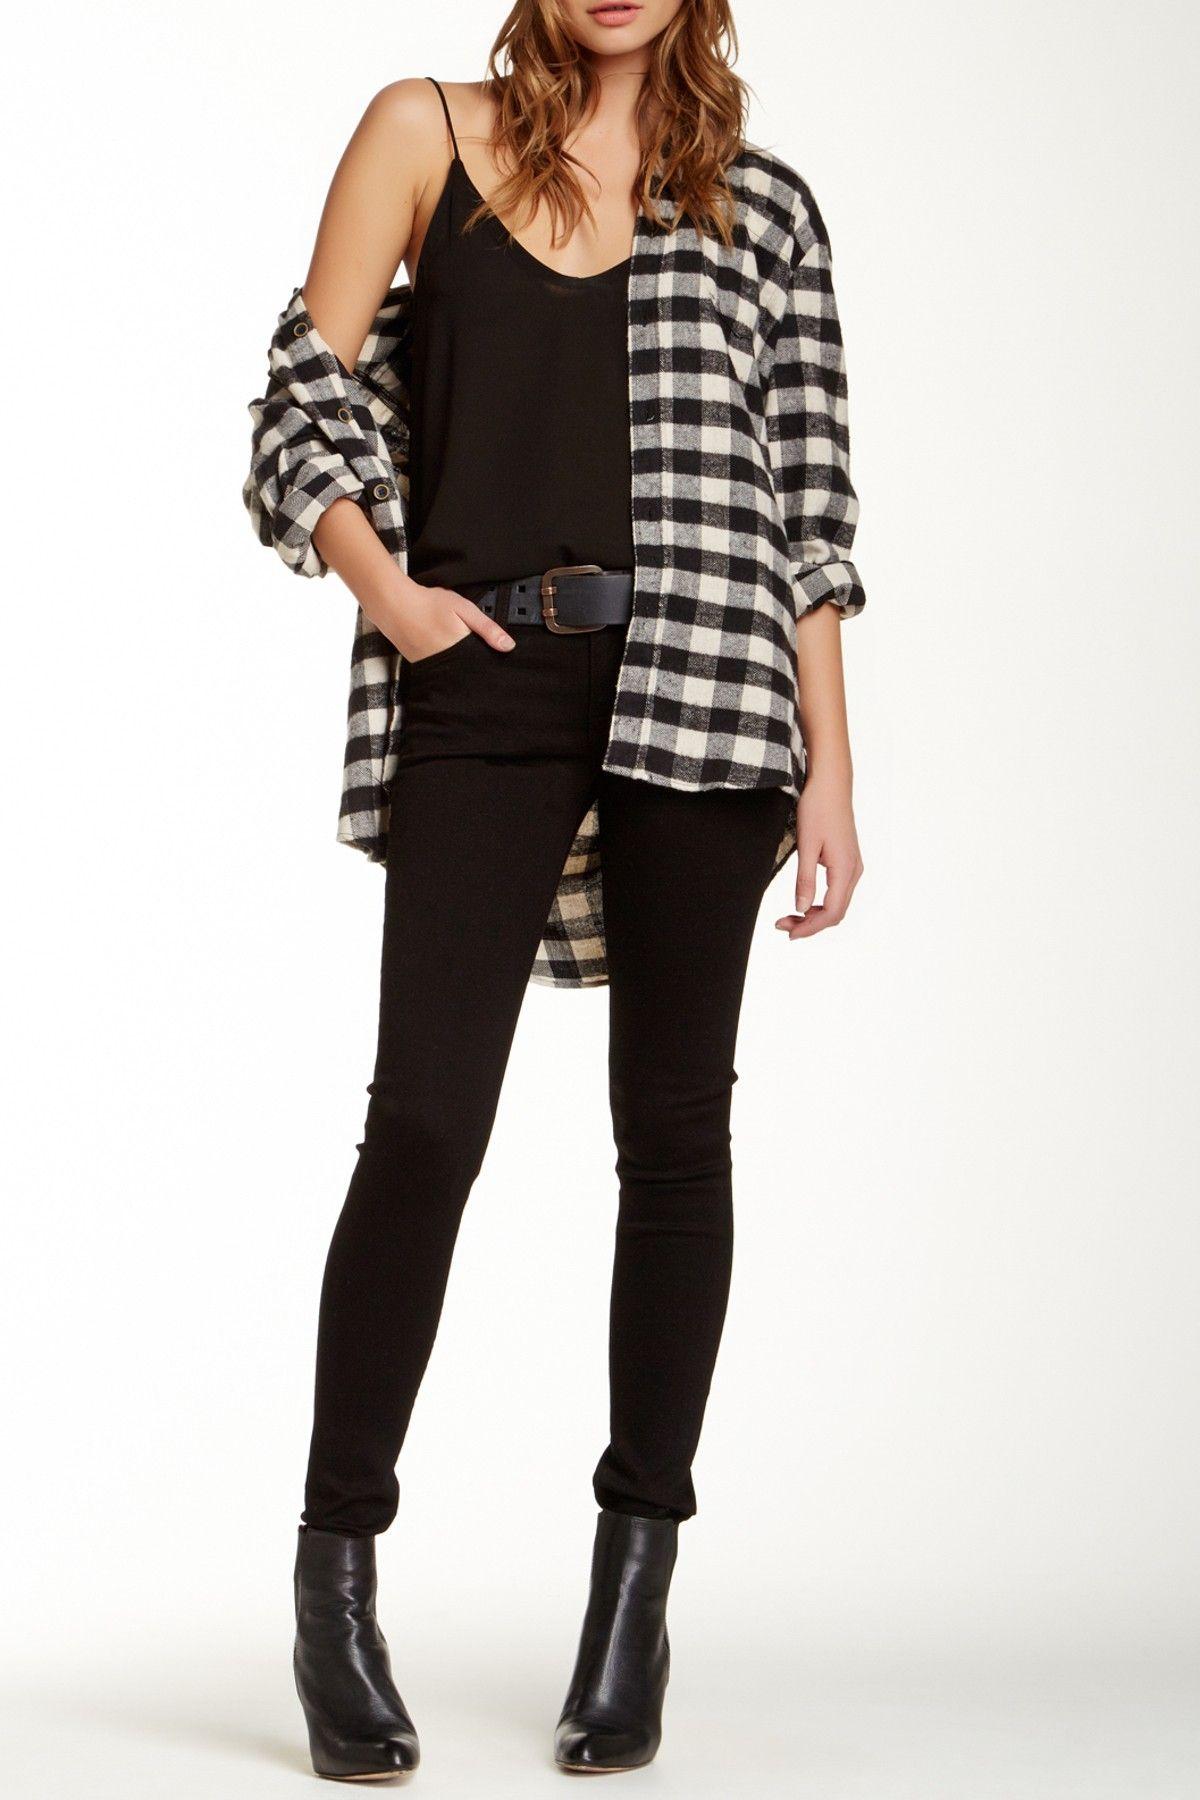 Krista Super Skinny Supermodel Jean